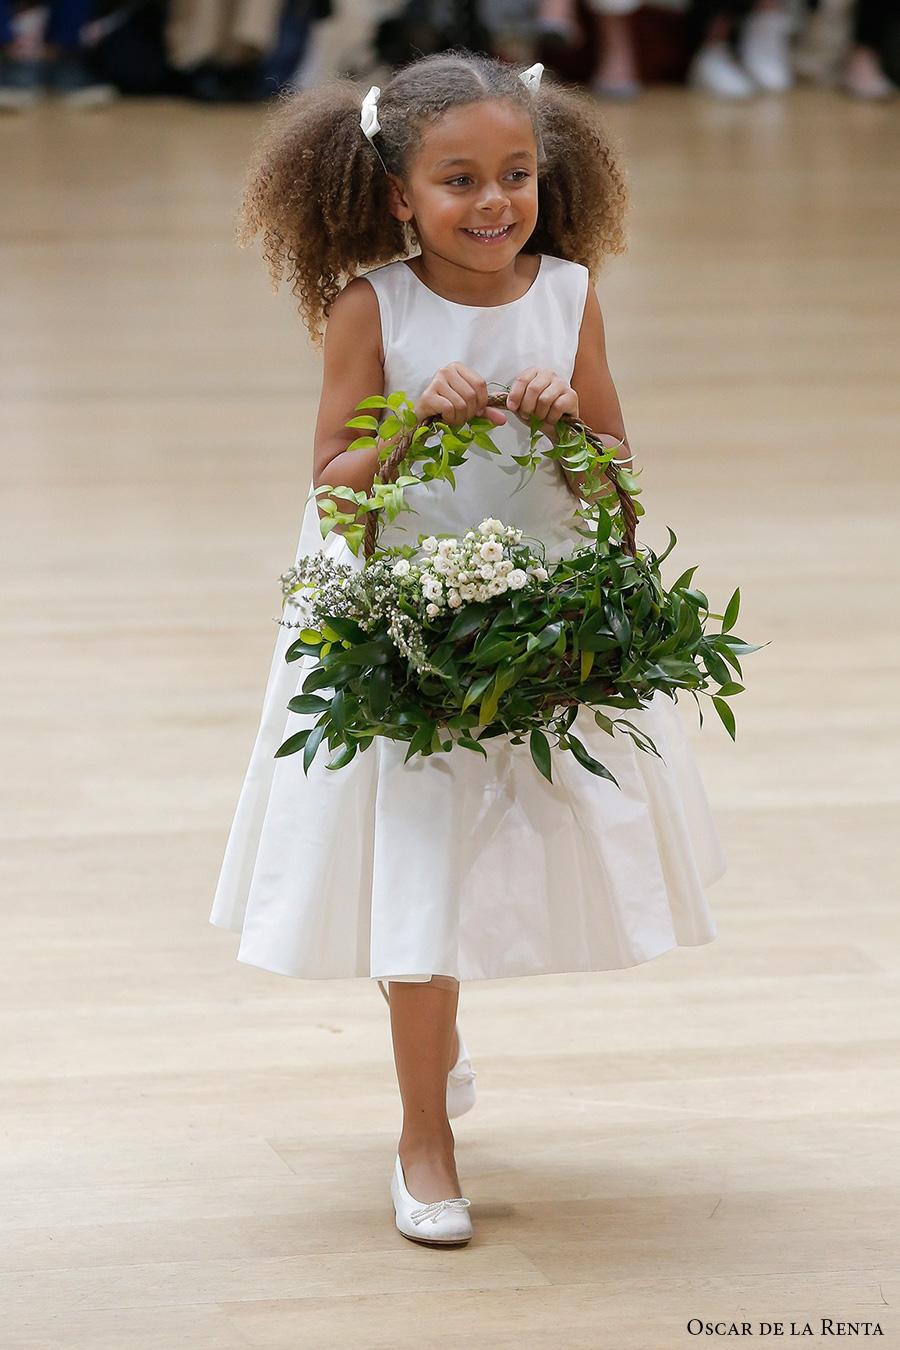 oscar de la renta spring 2018 bridal pretty flower girl dress (101) mv